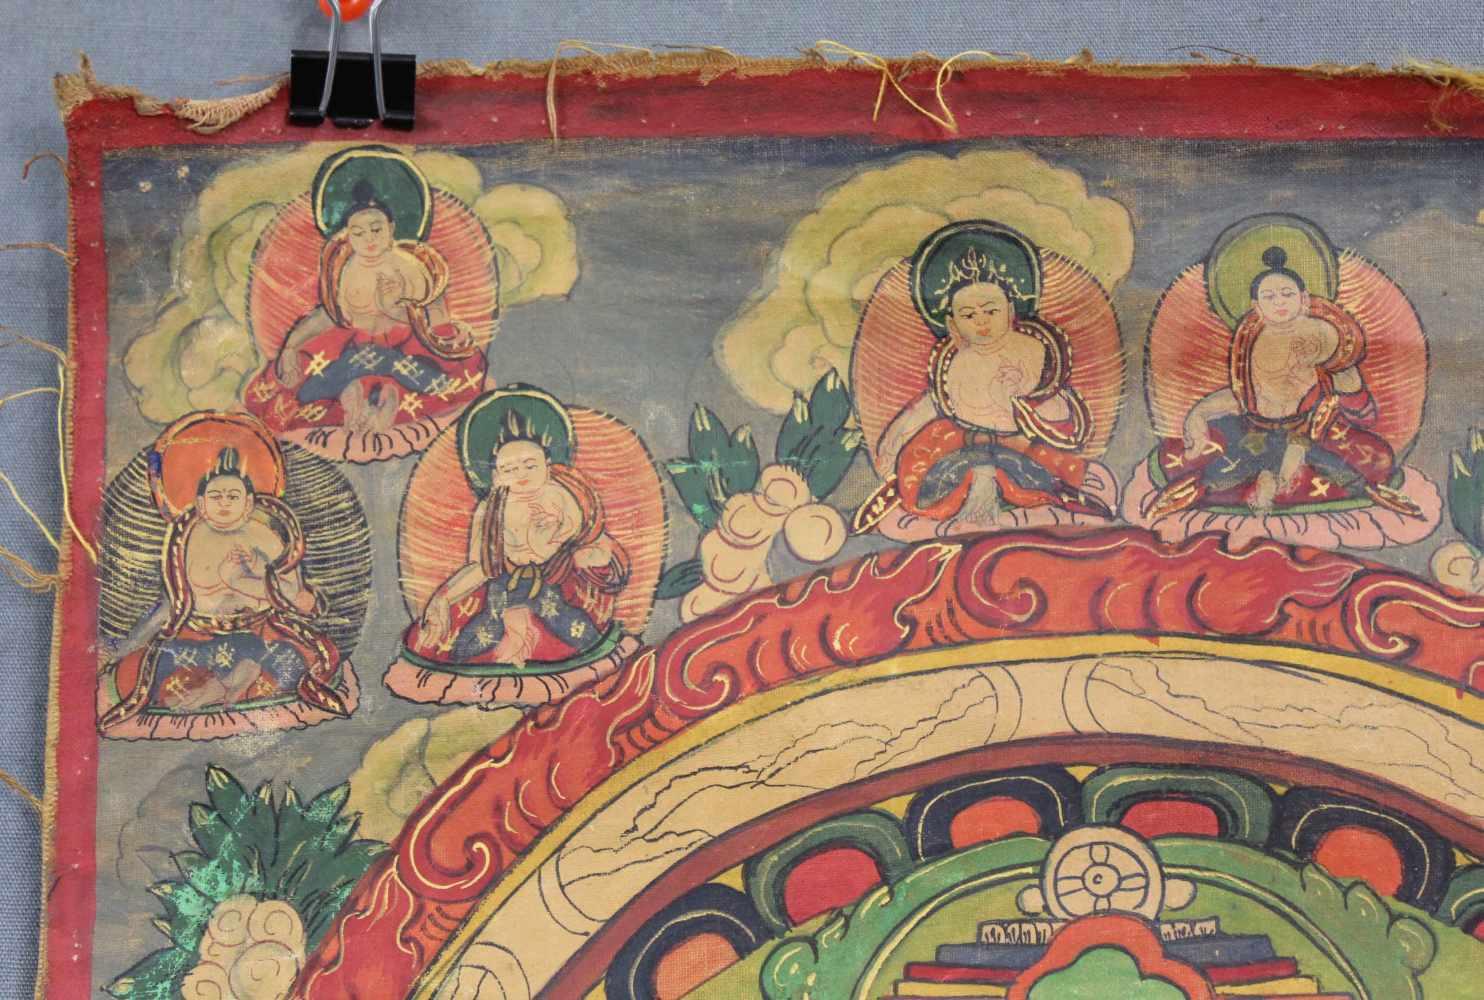 Lot 60 - Mandala / Thangka, China / Tibet alt.42,5 cm x 33 cm. Gemälde. Der Lahsa Palast. Deutlich zu